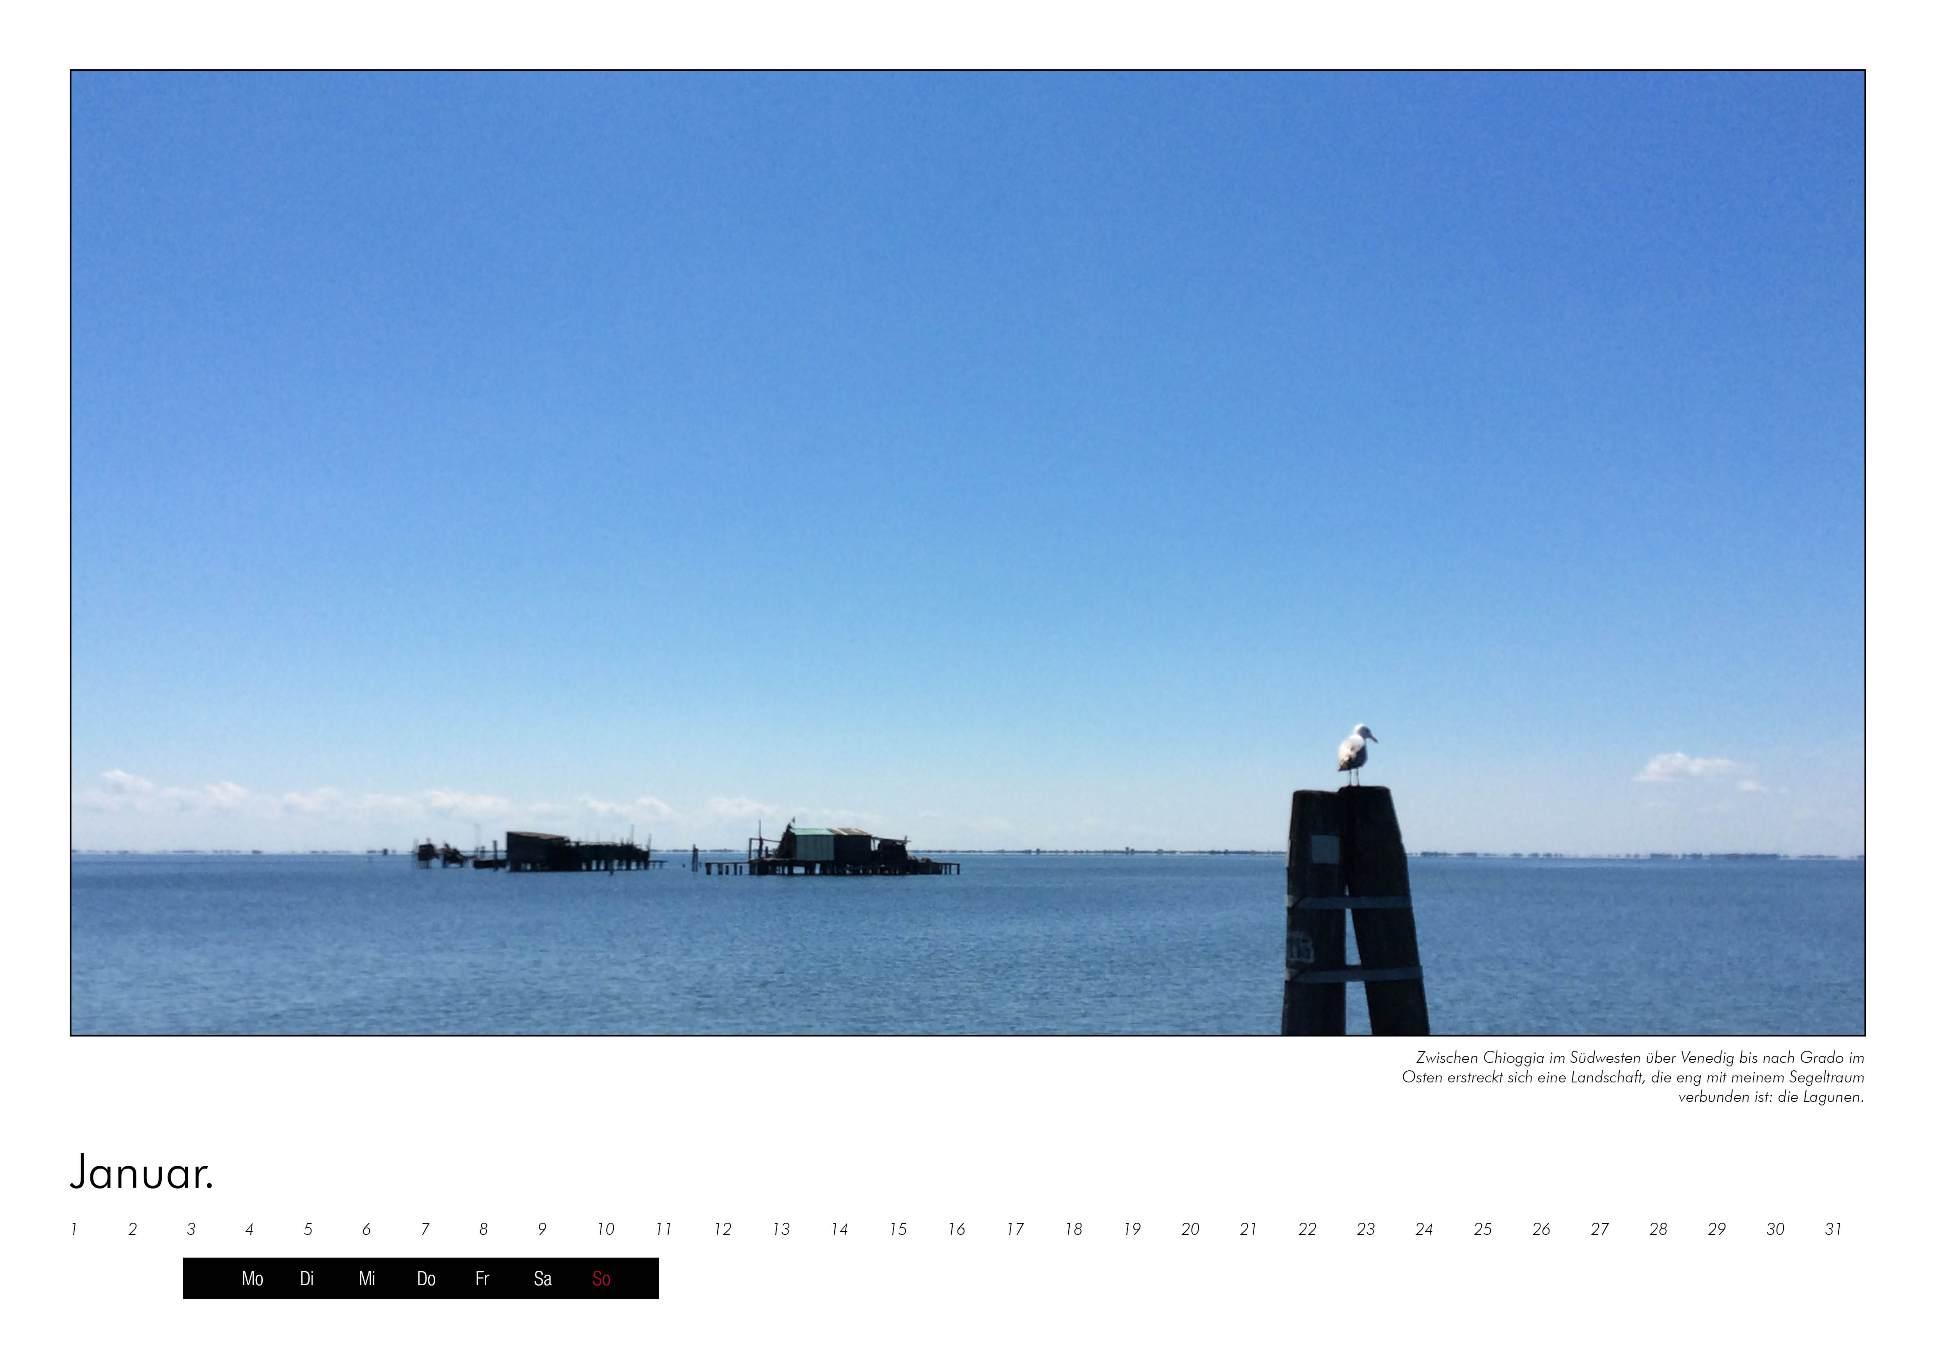 Bild des Meers vor den Lagunen Venedigs im immerwährenden Kalender